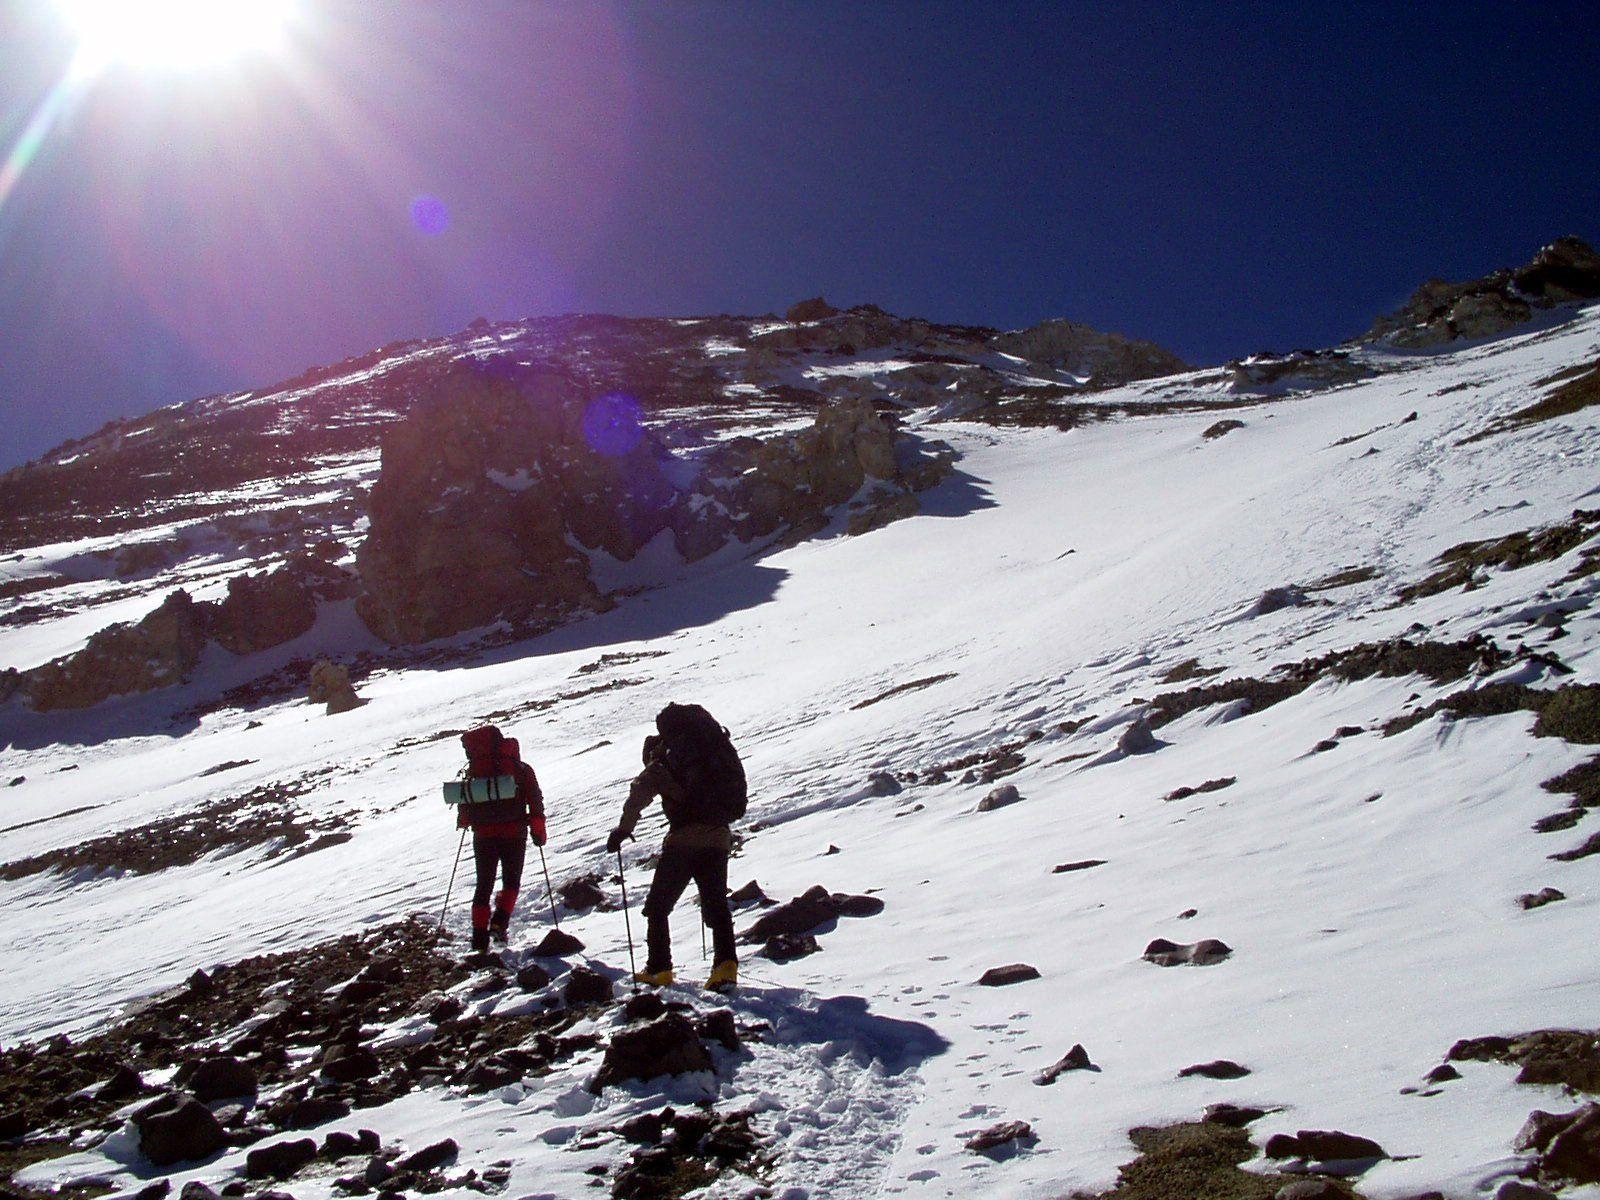 Anstieg zum Aconcagua - 7summits4help